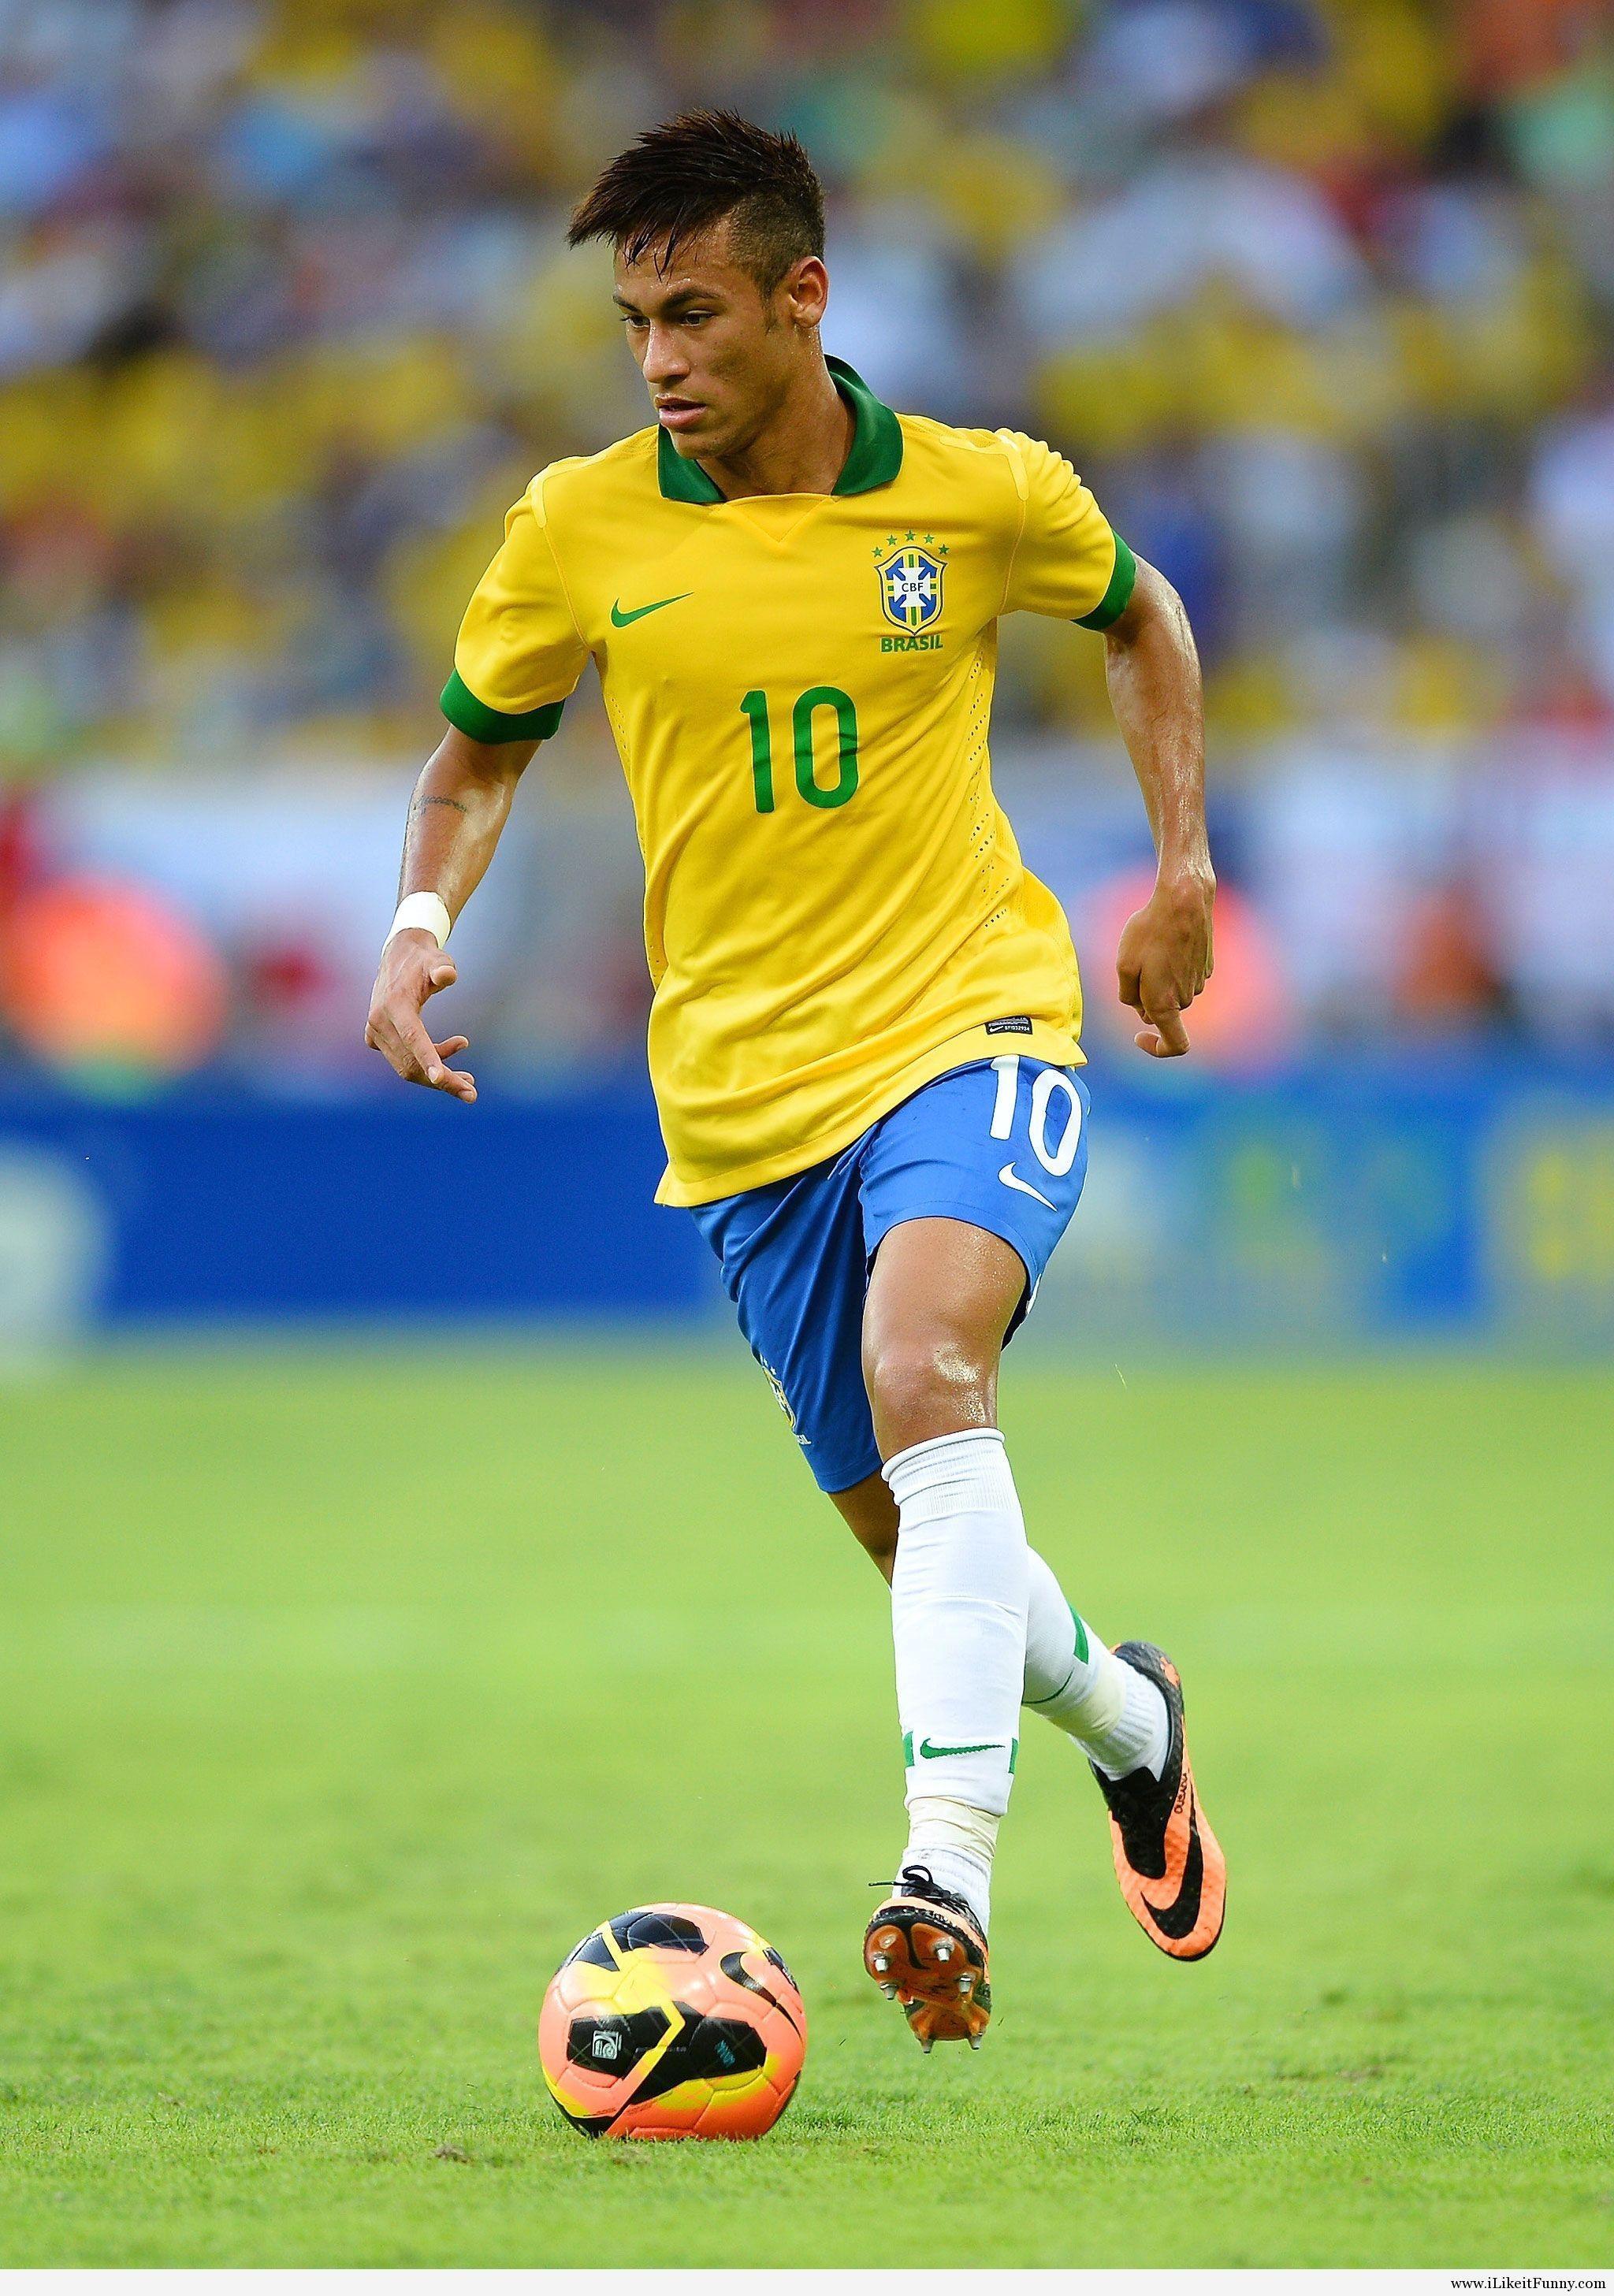 top Neymar Brazil Wallpaper 2018 HD 2048x2914 for iphone 7